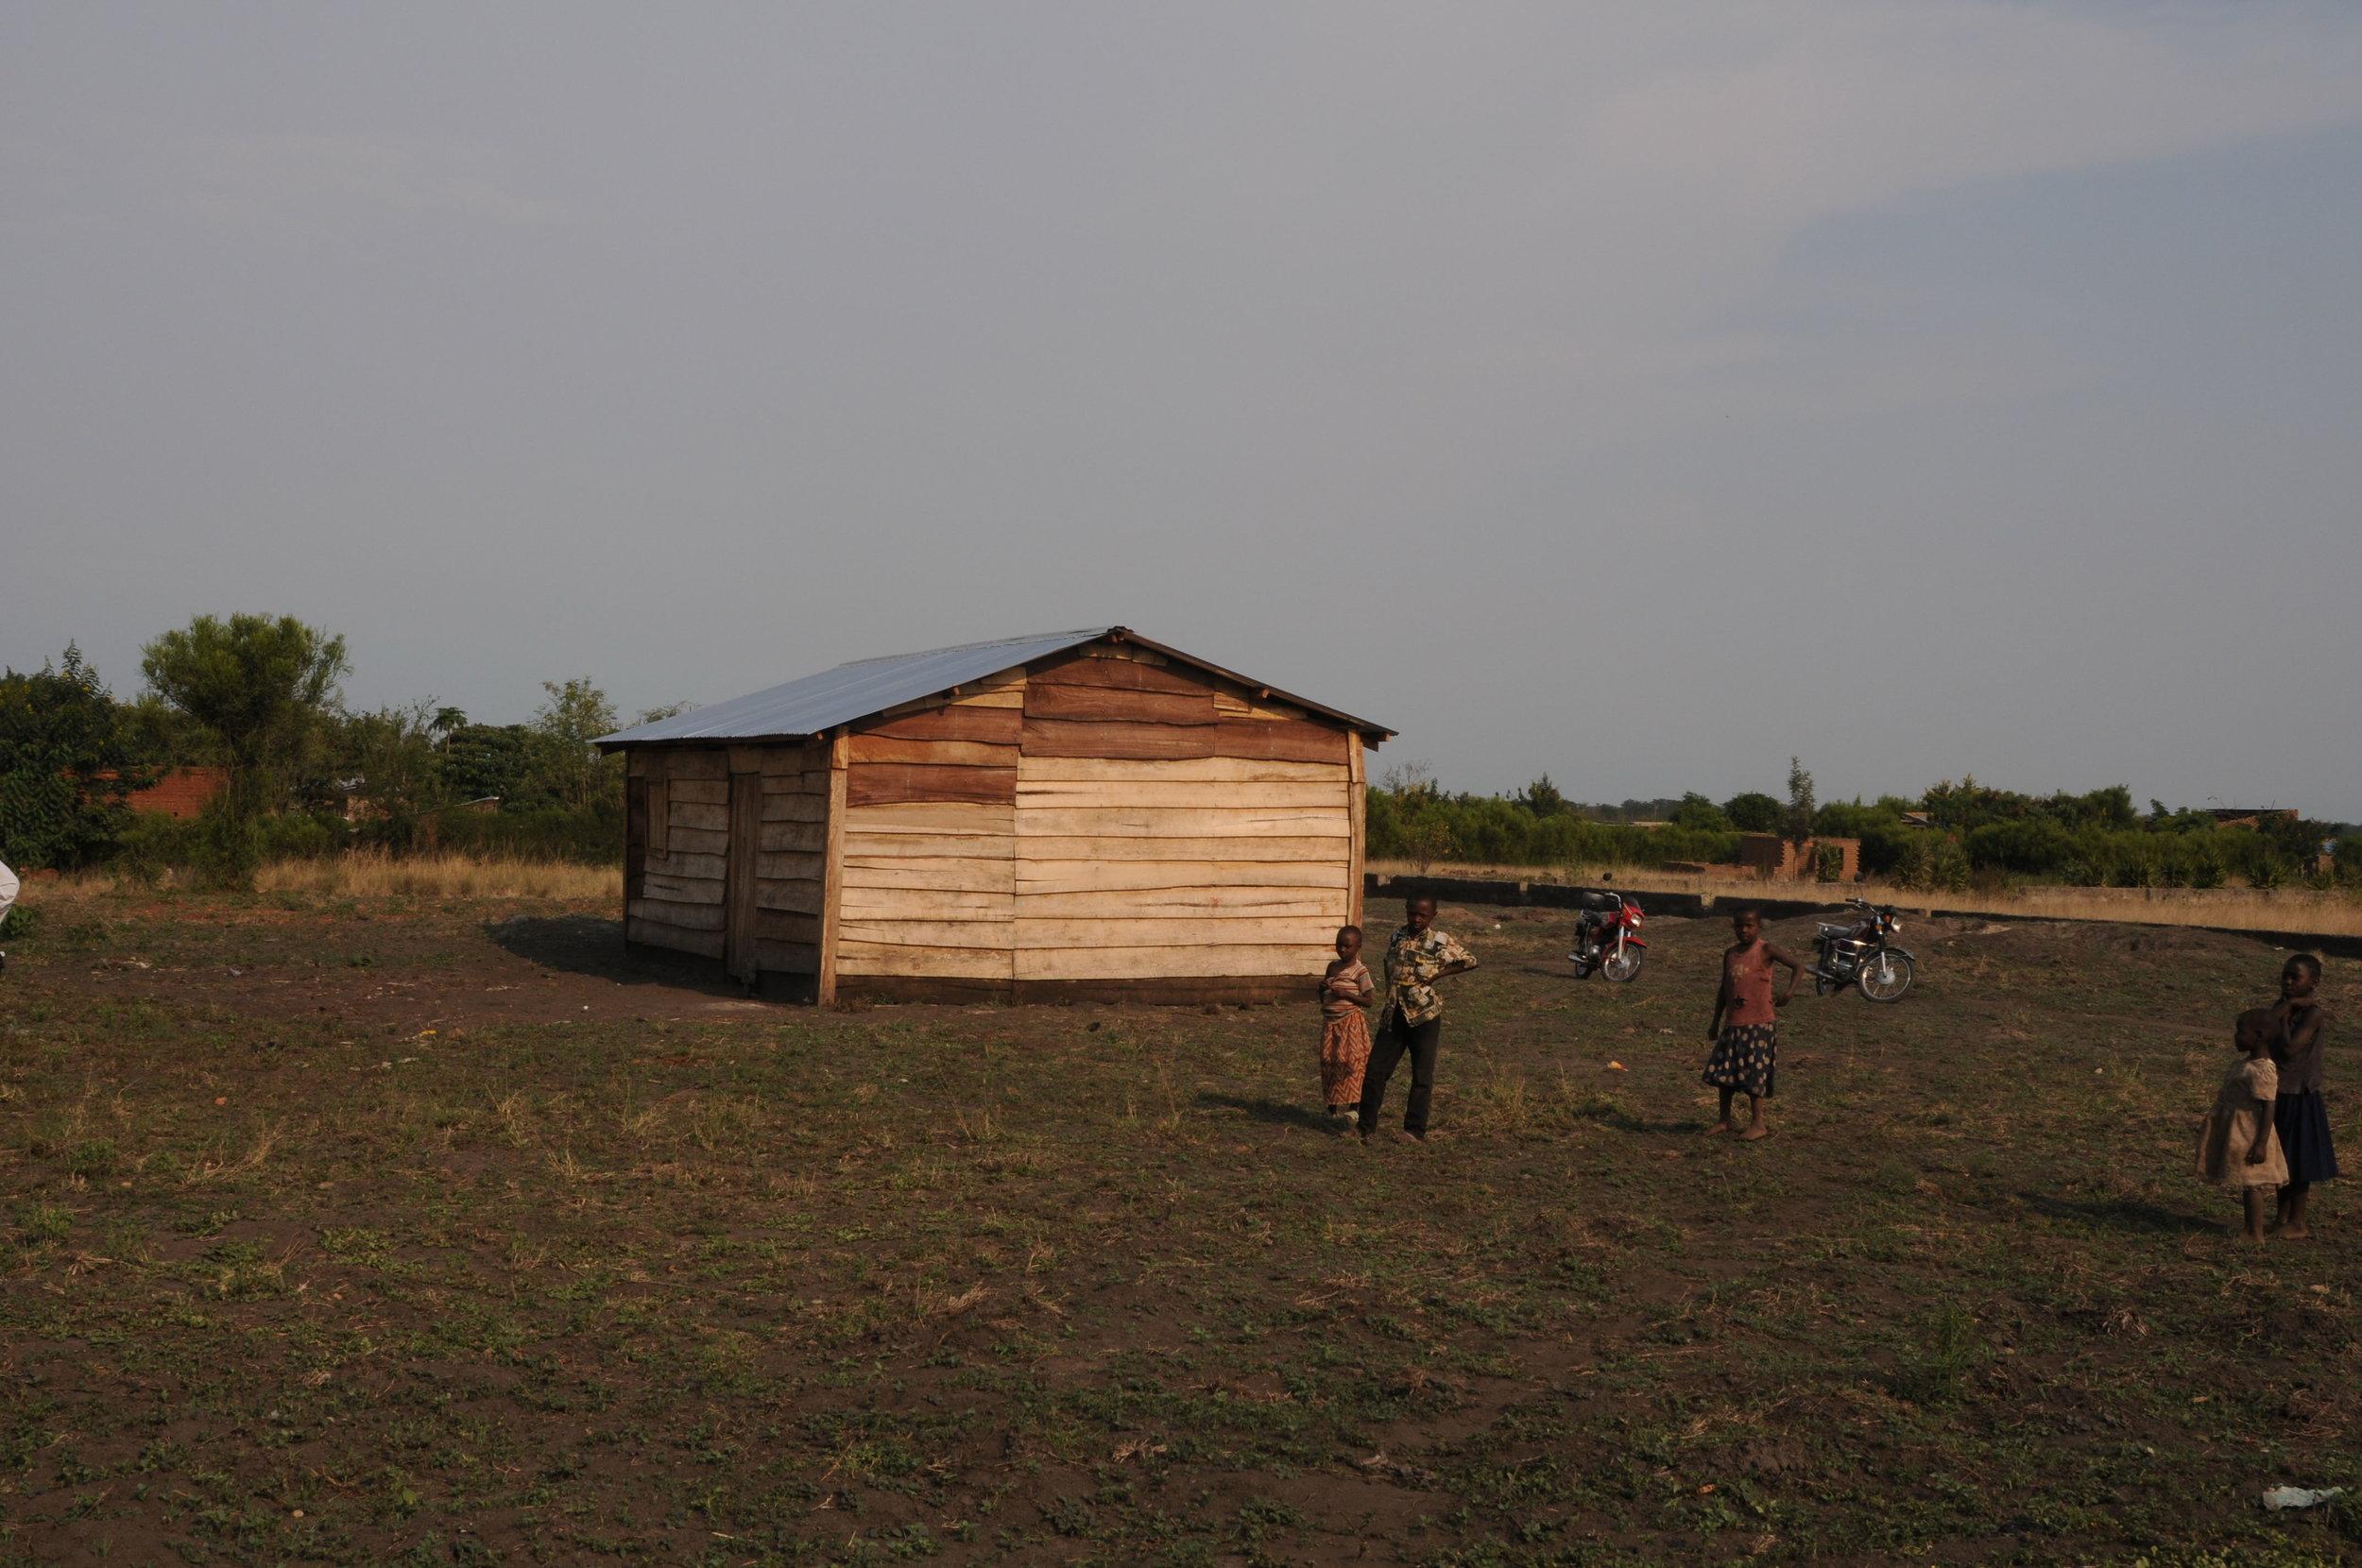 Before we built the Children's Village